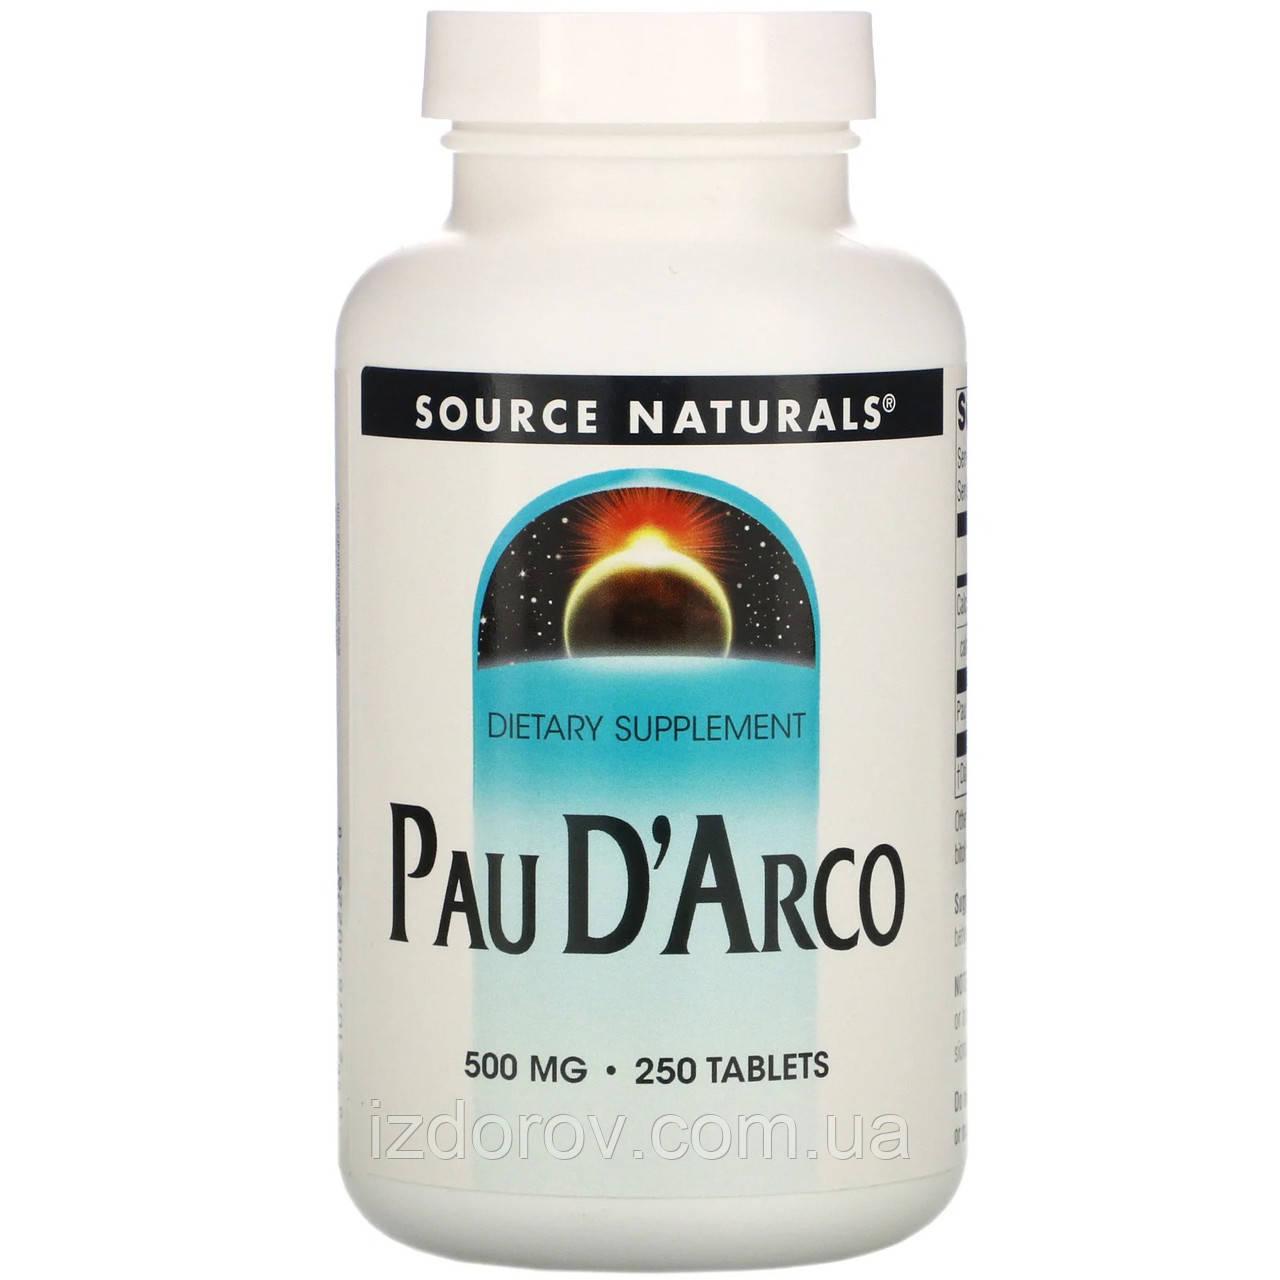 Source Naturals, Кора муравьиного дерева Pau D'Arco 500 мг, Пау Д'Арко, природный антибиотик, 250 таблеток